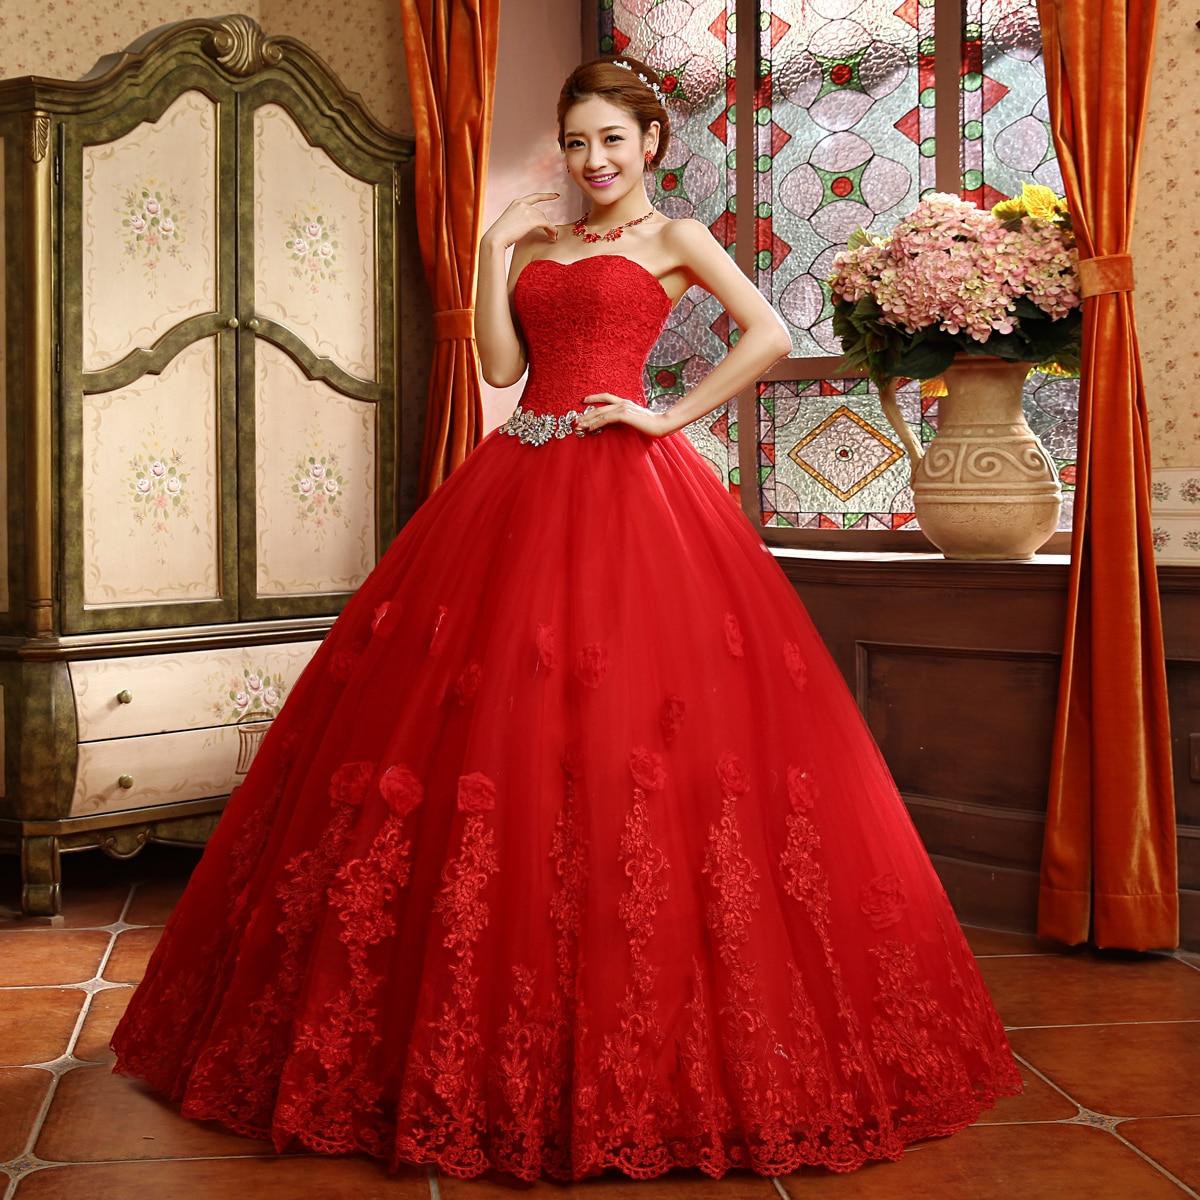 red wedding dresses red dress for wedding Callista